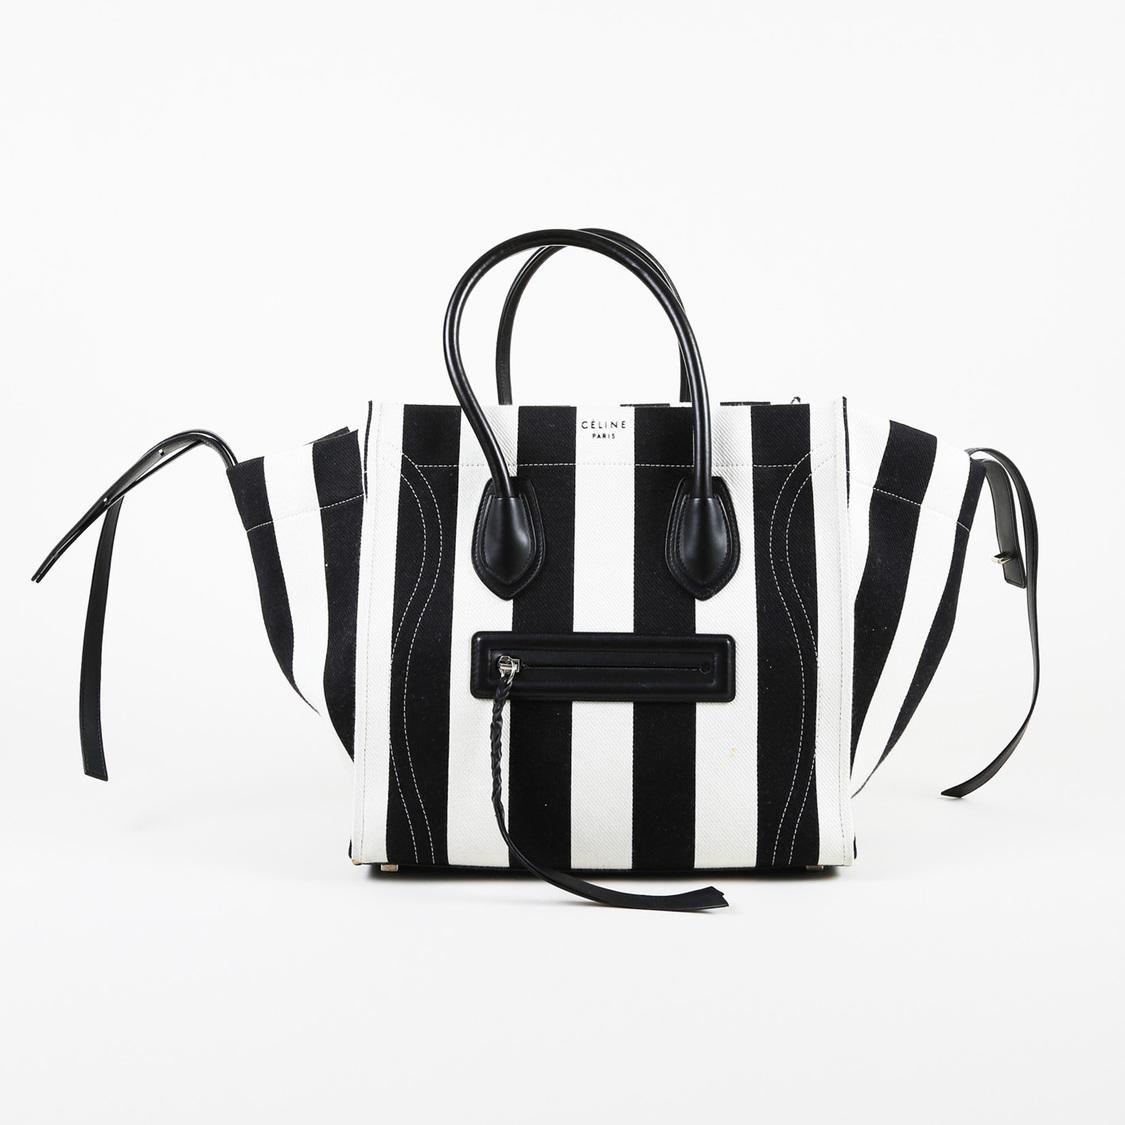 Lyst - Céline Black White Striped Canvas